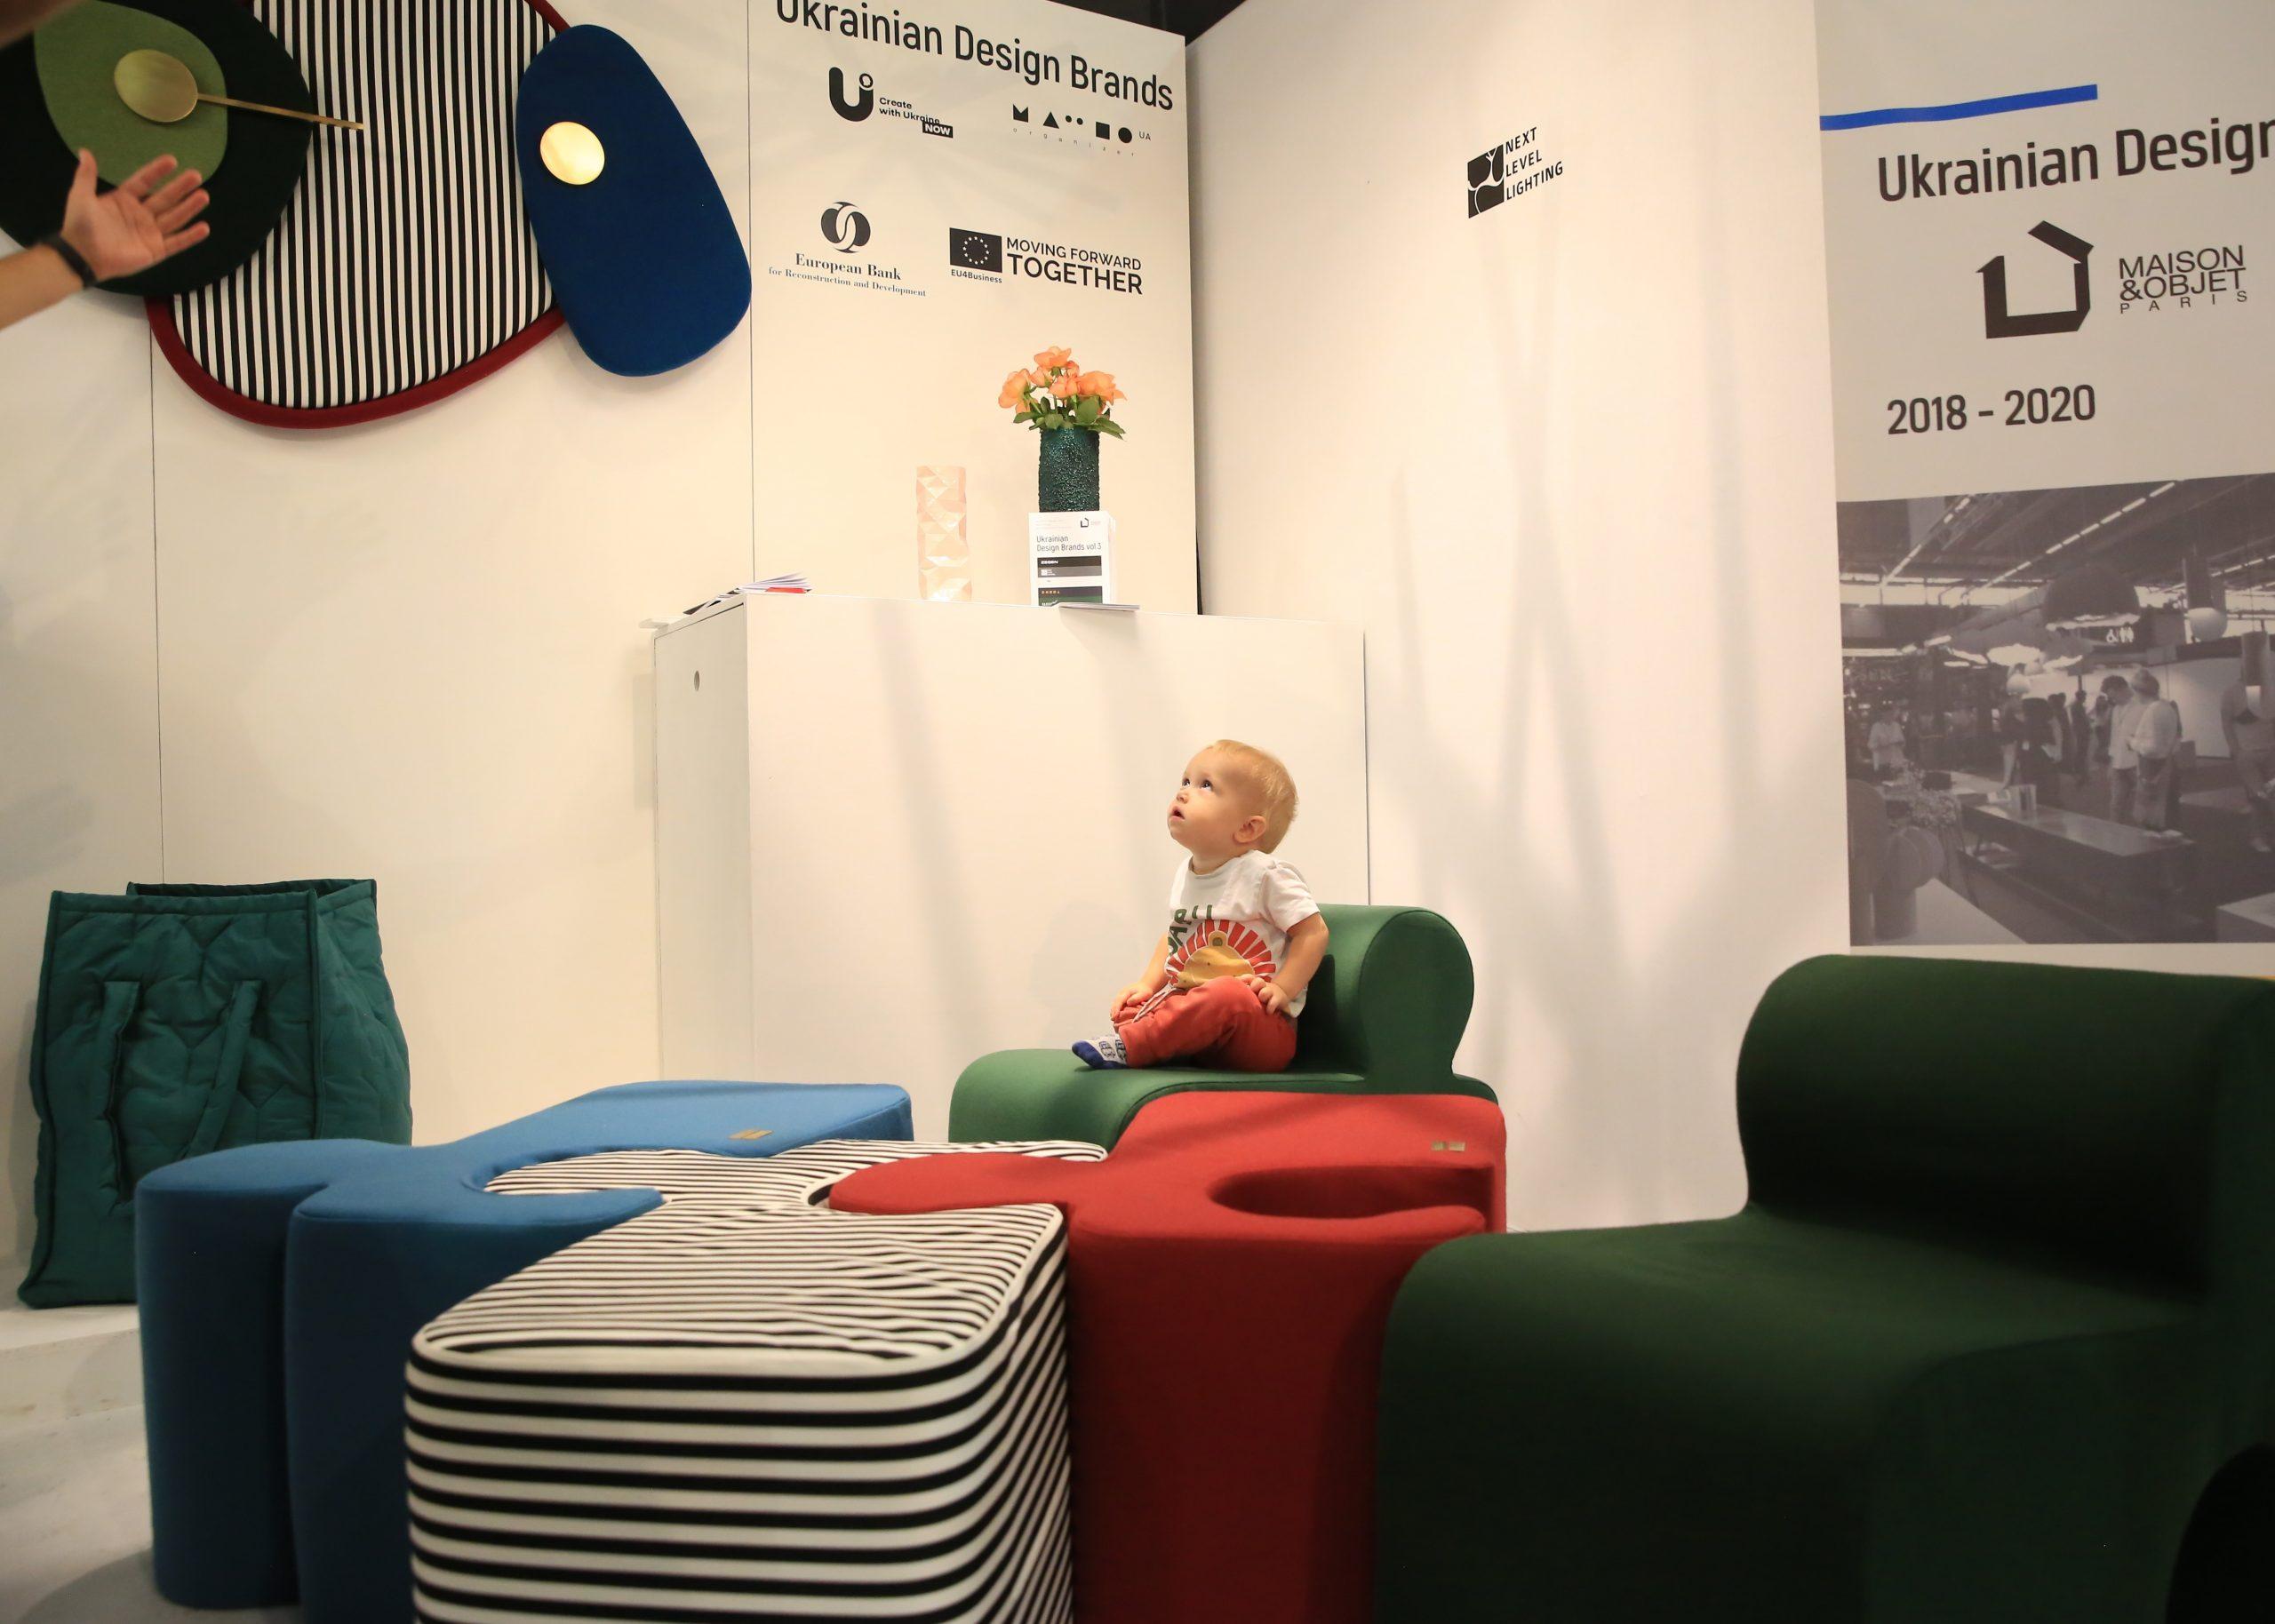 Maison & Objet-2020, Париж